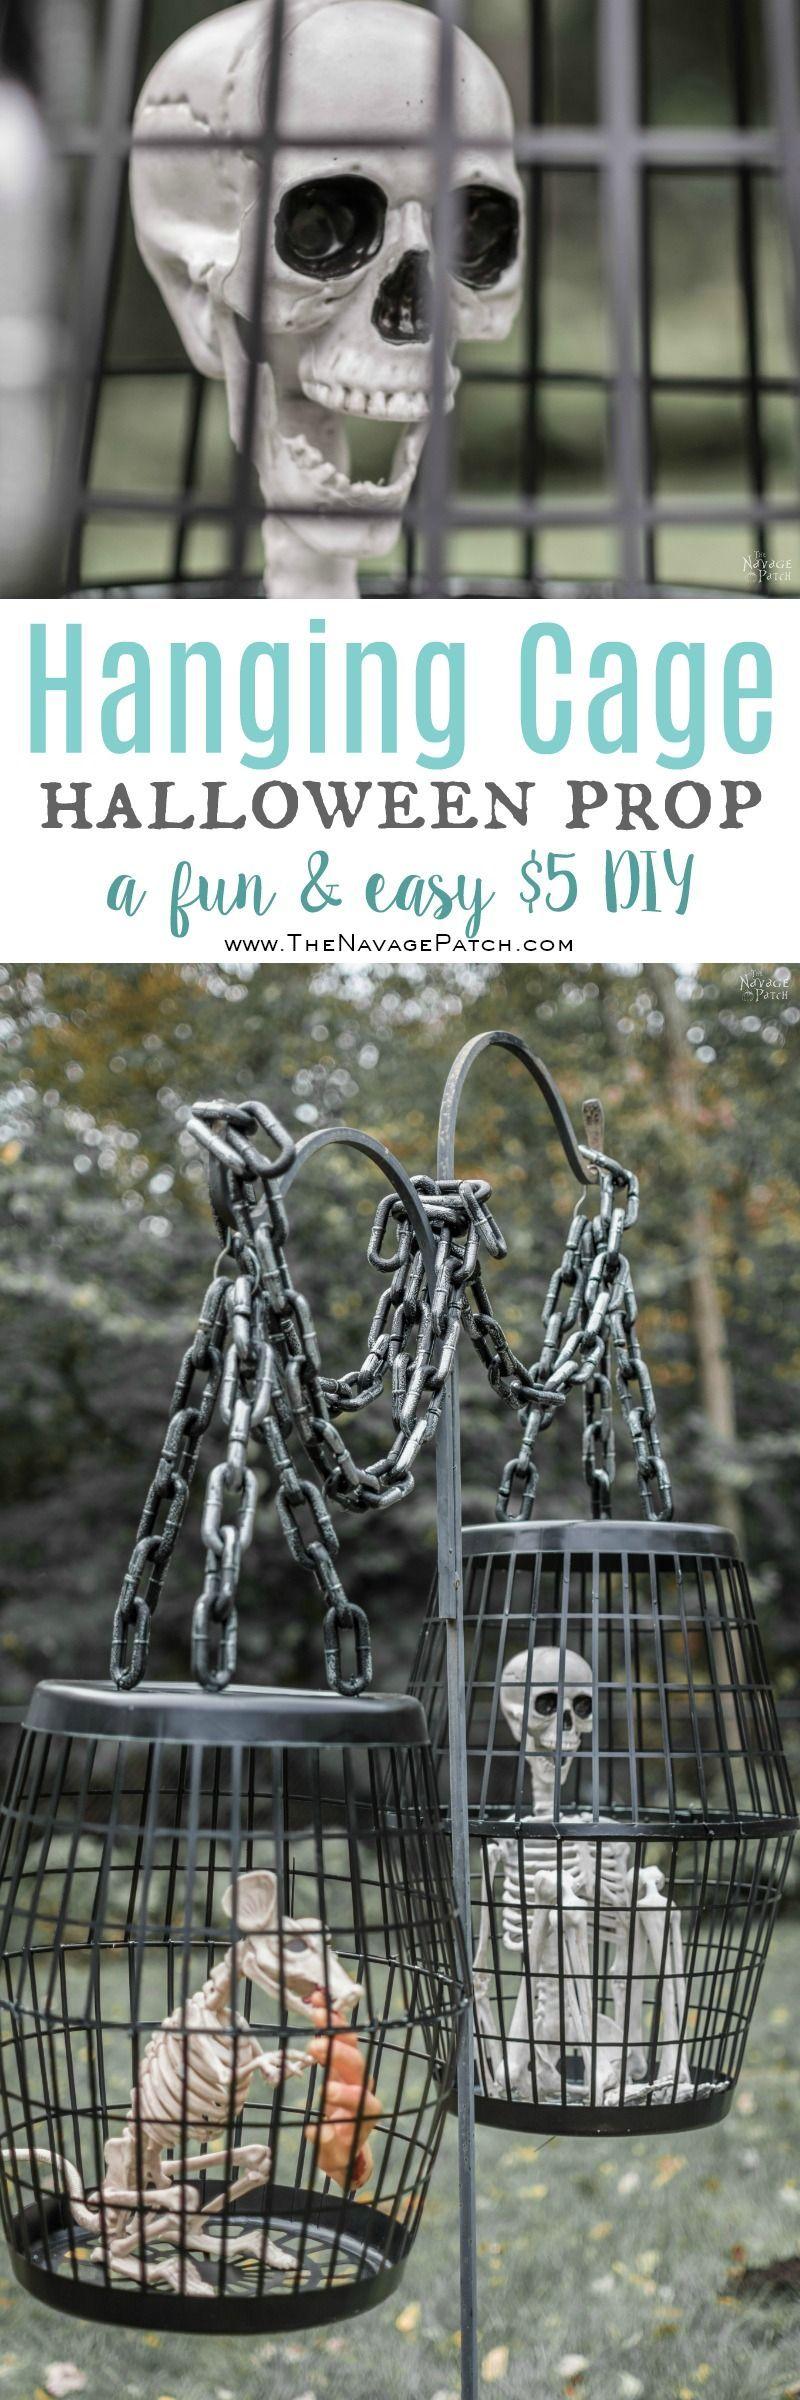 Hanging Cage Halloween Prop DIY Halloween decor with Dollar store - cool homemade halloween decorations